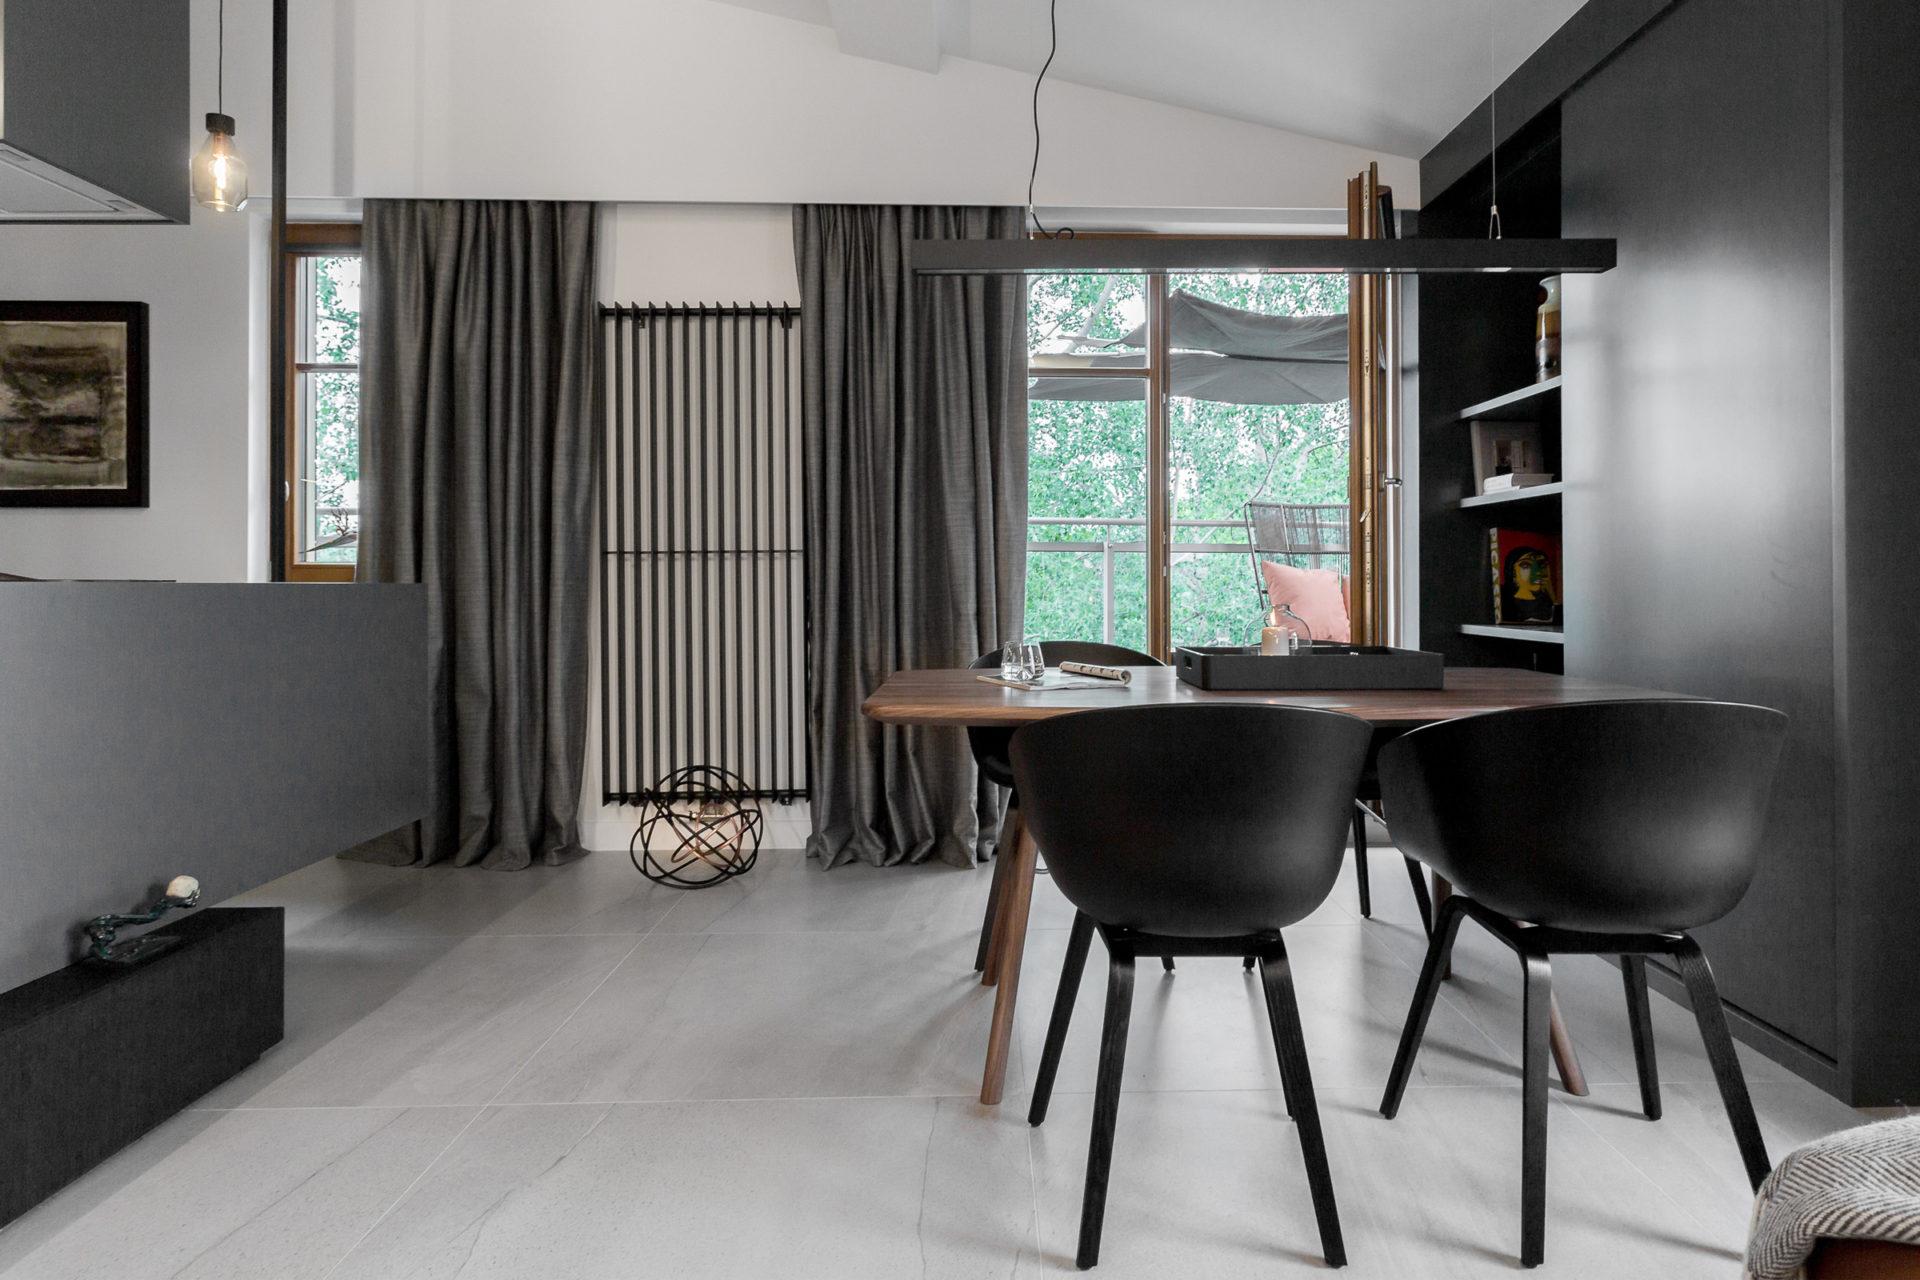 Apartament w Sopocie 2017 - 03